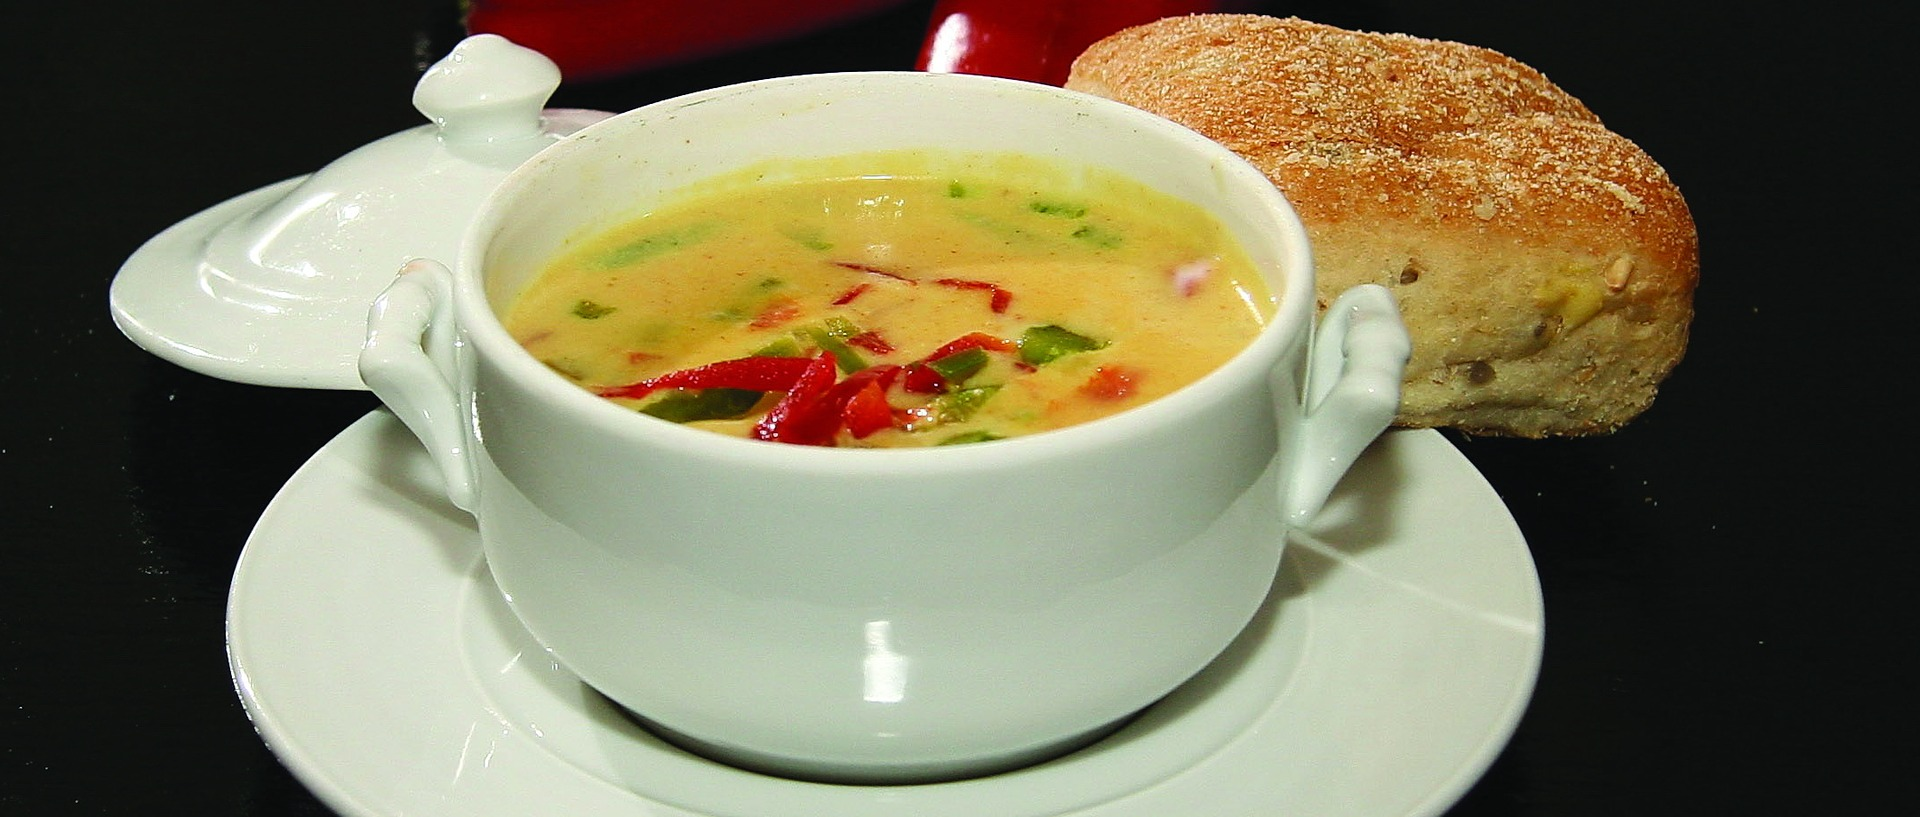 sopa de curry massaman, sopa de curry tailandes, curry thai, curry massaman